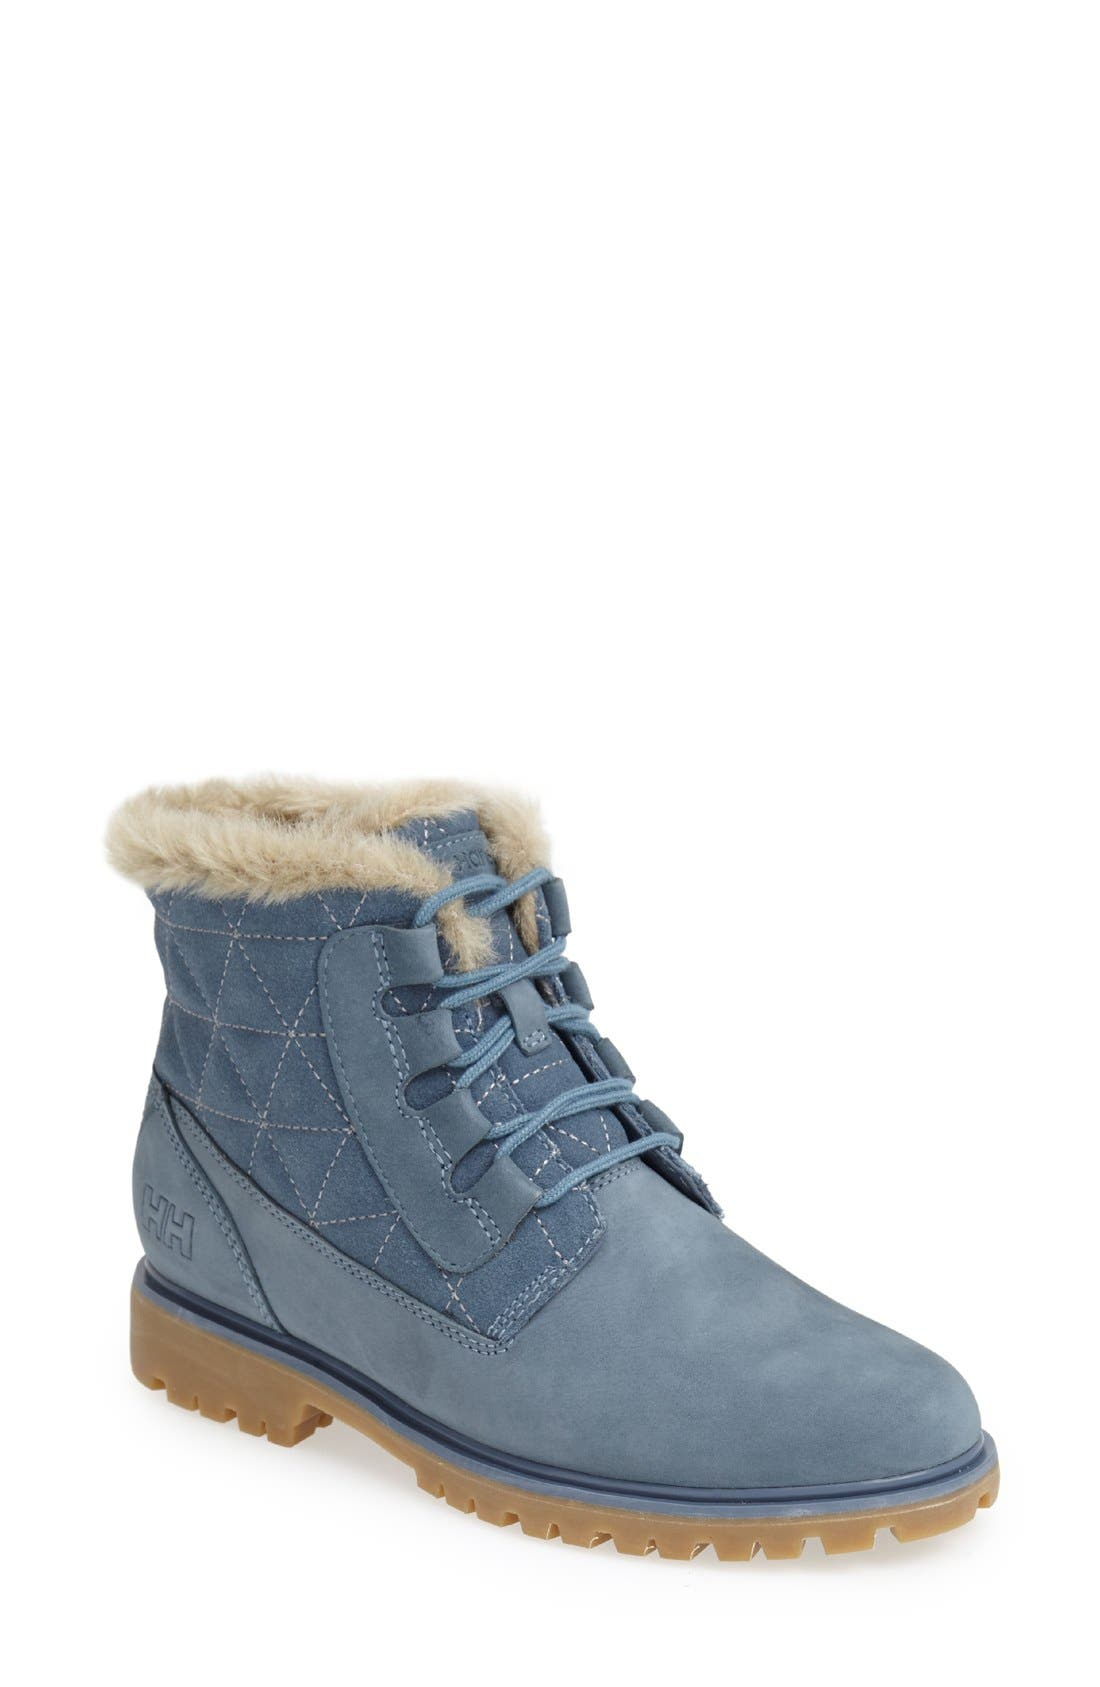 'Vega' Waterproof Leather Boot,                             Main thumbnail 1, color,                             400